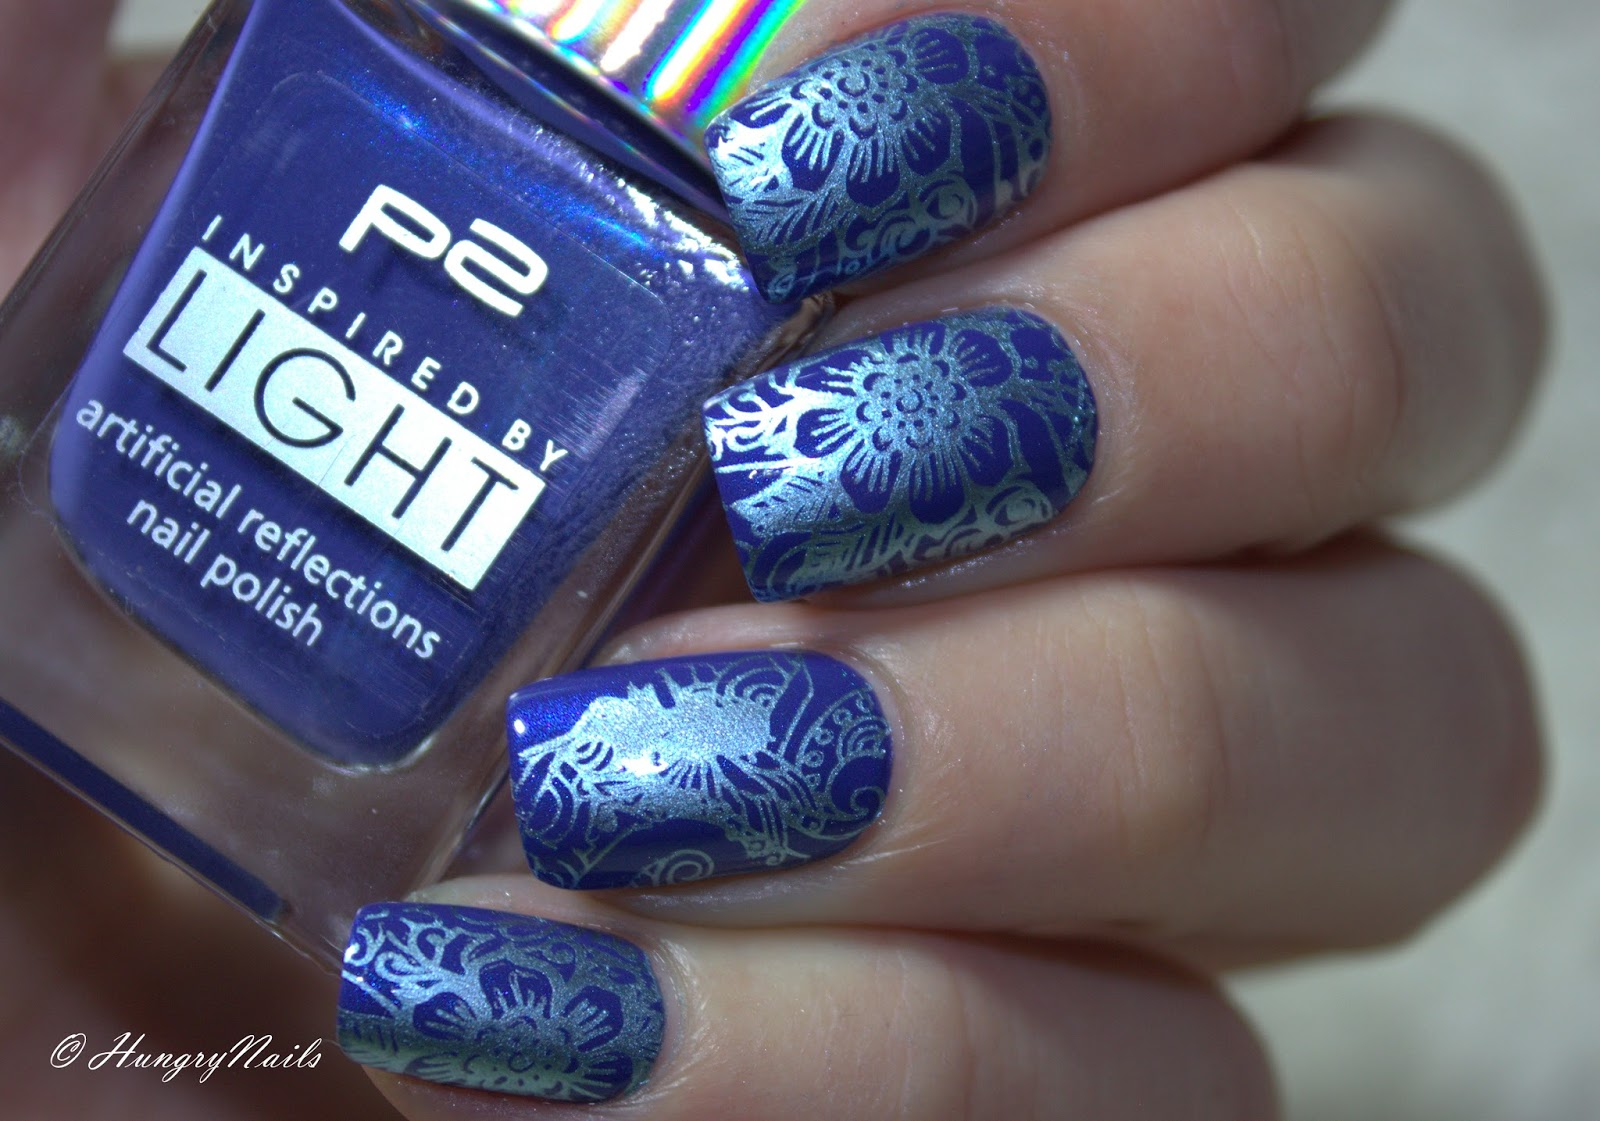 http://hungrynails.blogspot.de/2015/01/blue-friday-spiegel-stamping-mit-p2-kiko.html